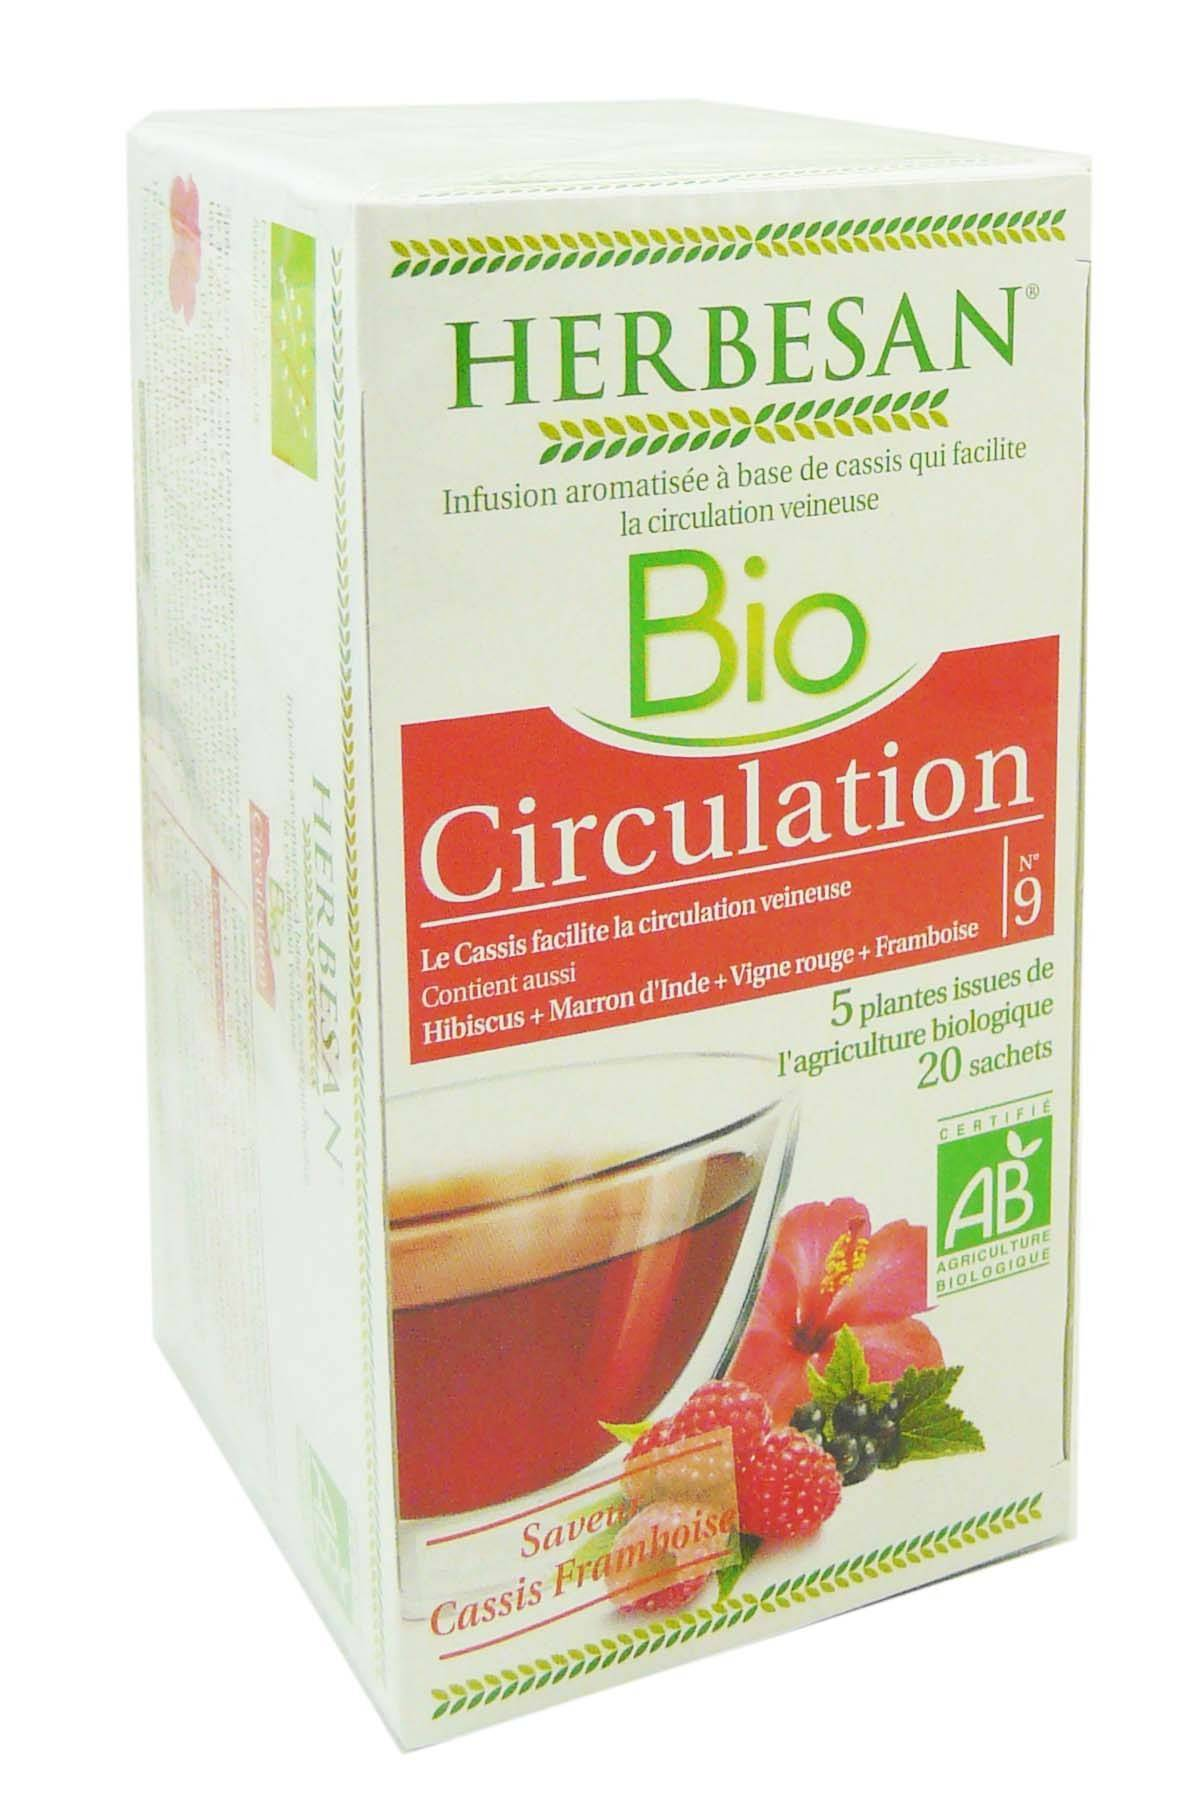 Herbesan infusion bio circulation 20 sachets